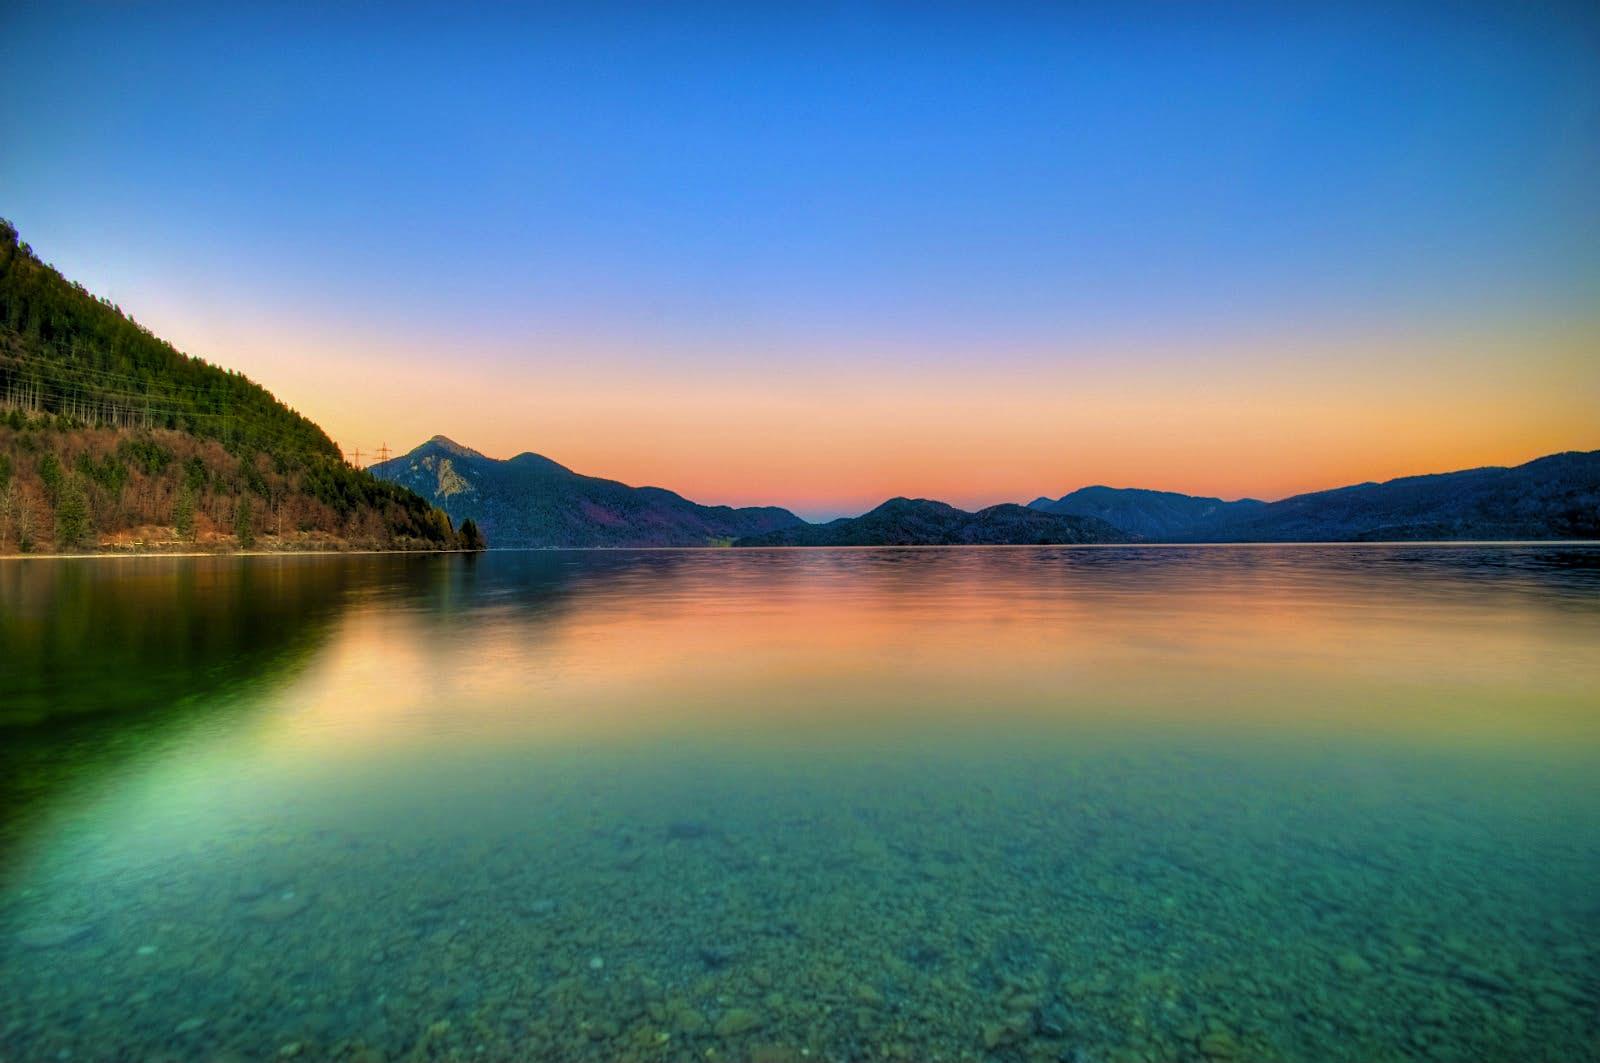 Explore offshore islands and swim in deep alpine waters in Lake Walchen © Luigi R. Viggiano / Getty Images